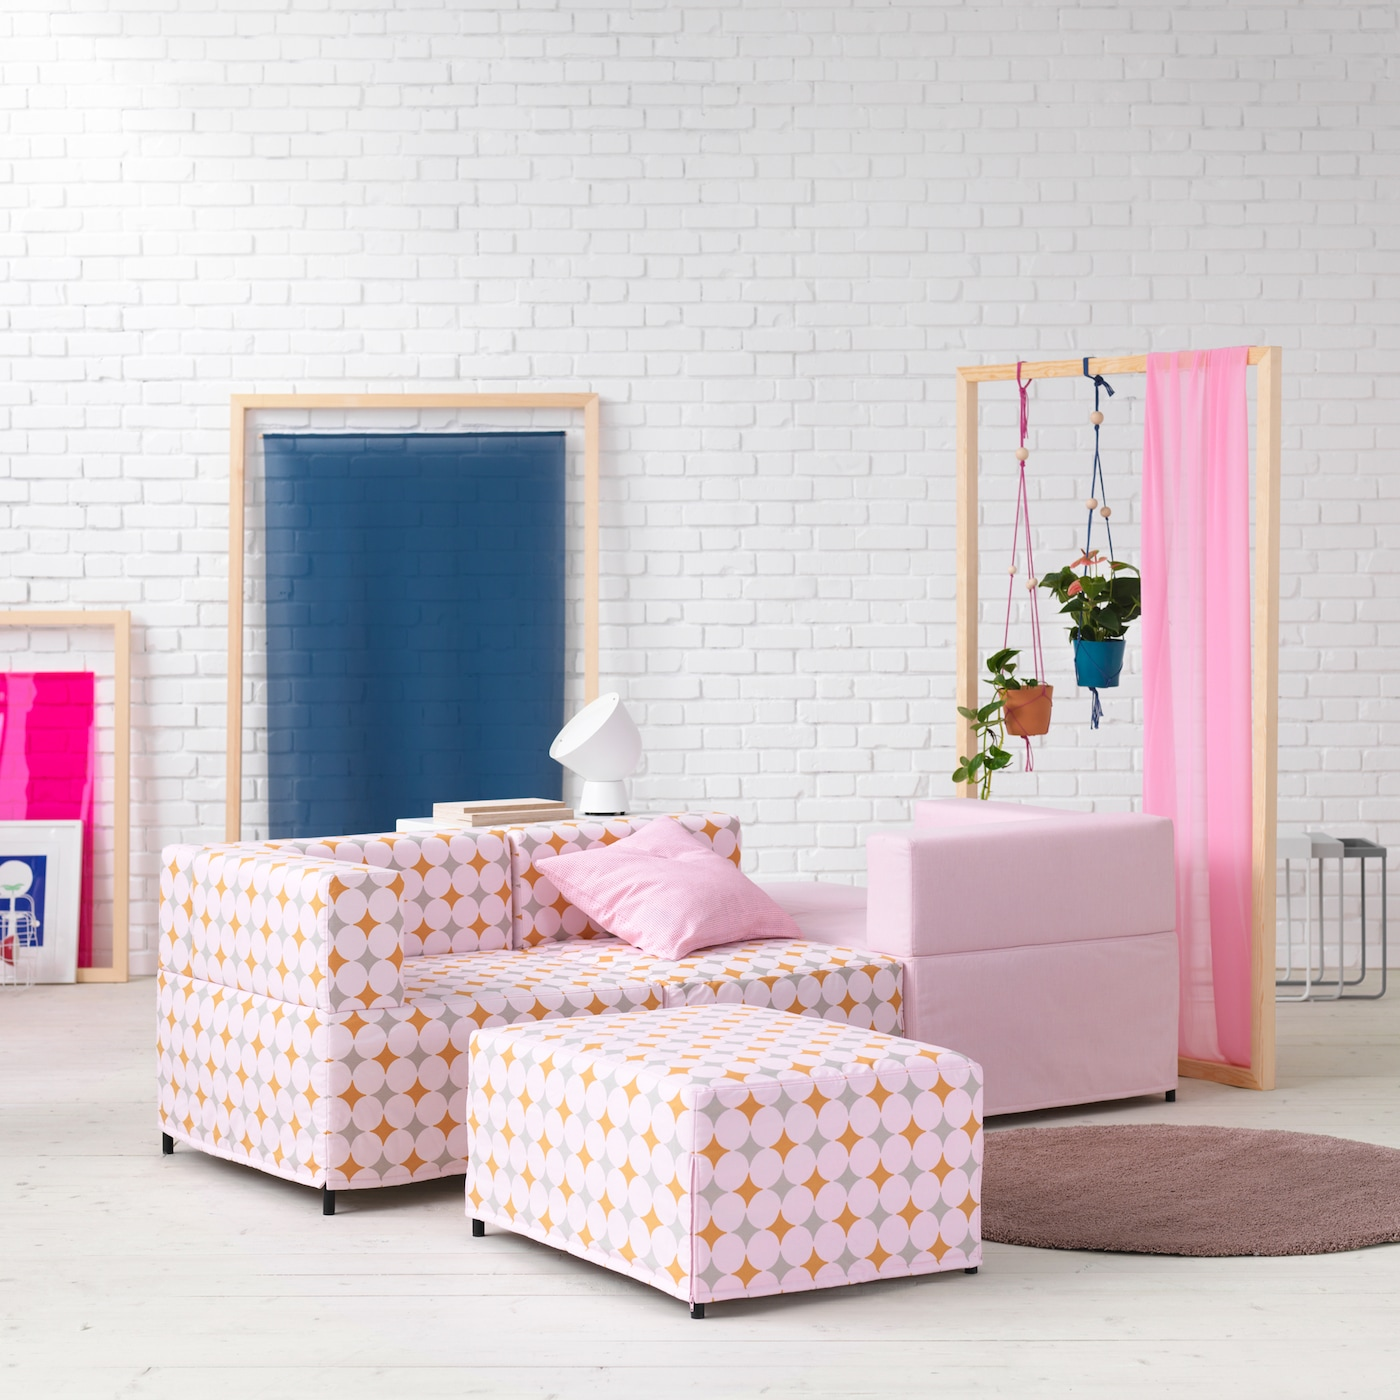 Modulsofa ikea - Ikea divano componibile ...